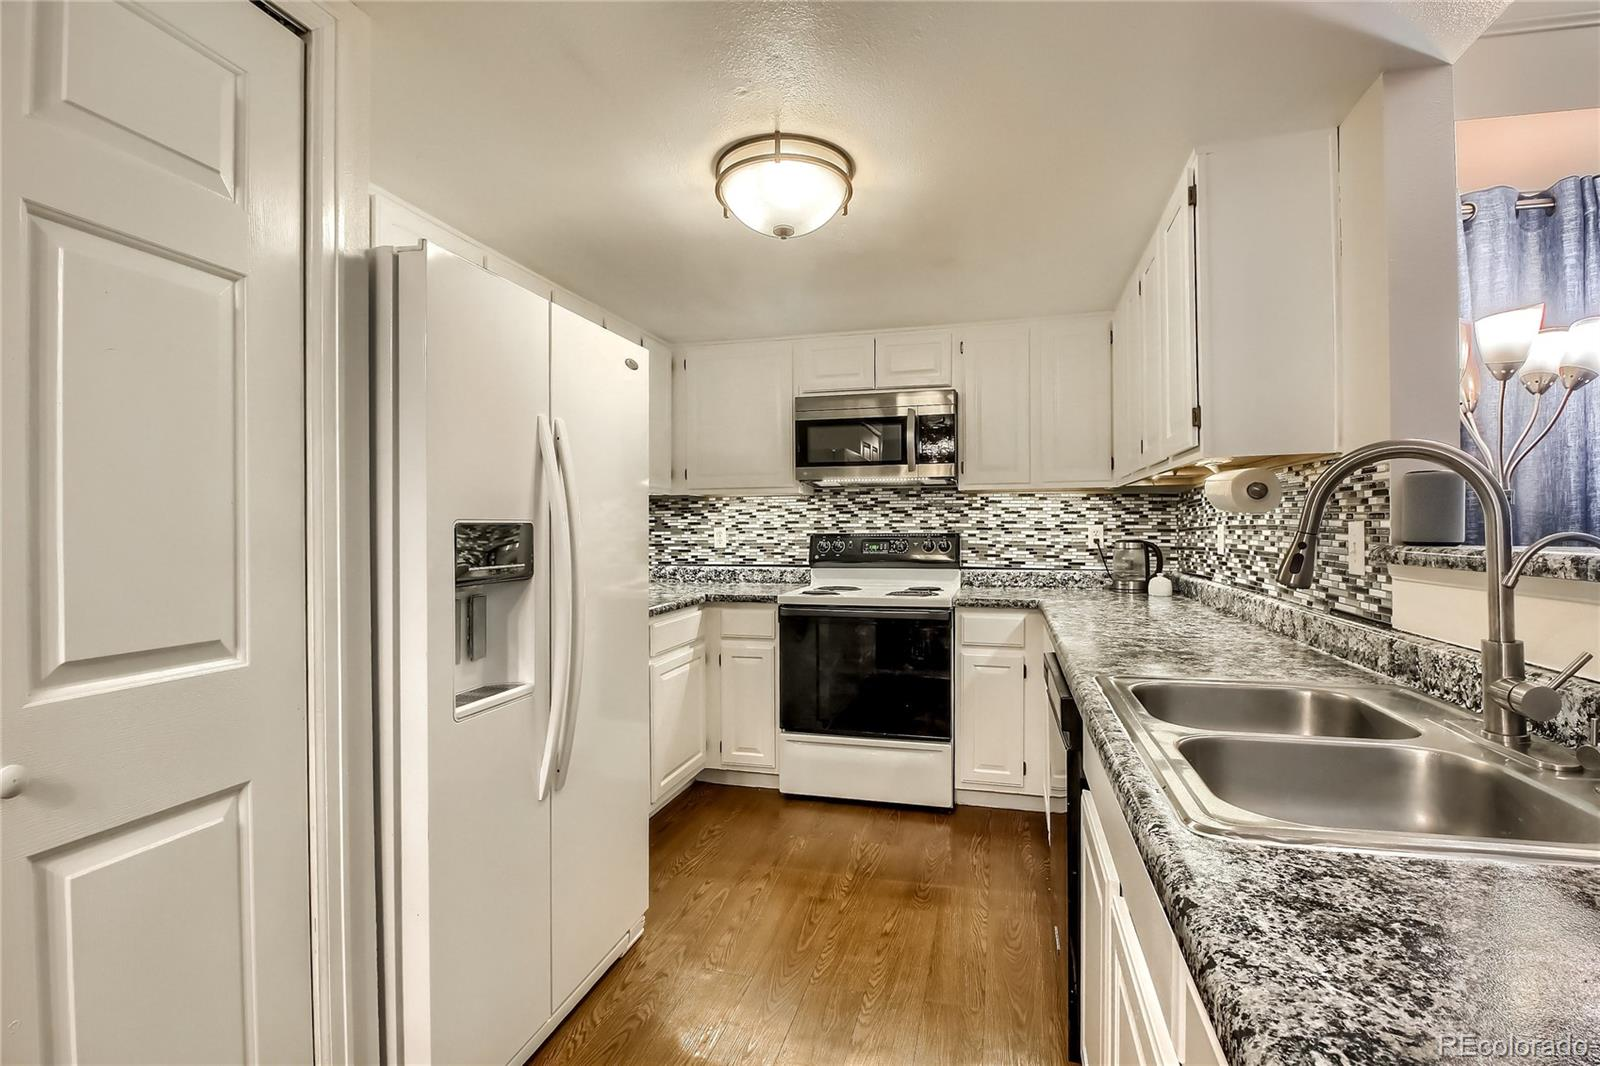 MLS# 8175765 - 6 - 12338 W Dorado Place #201, Littleton, CO 80127